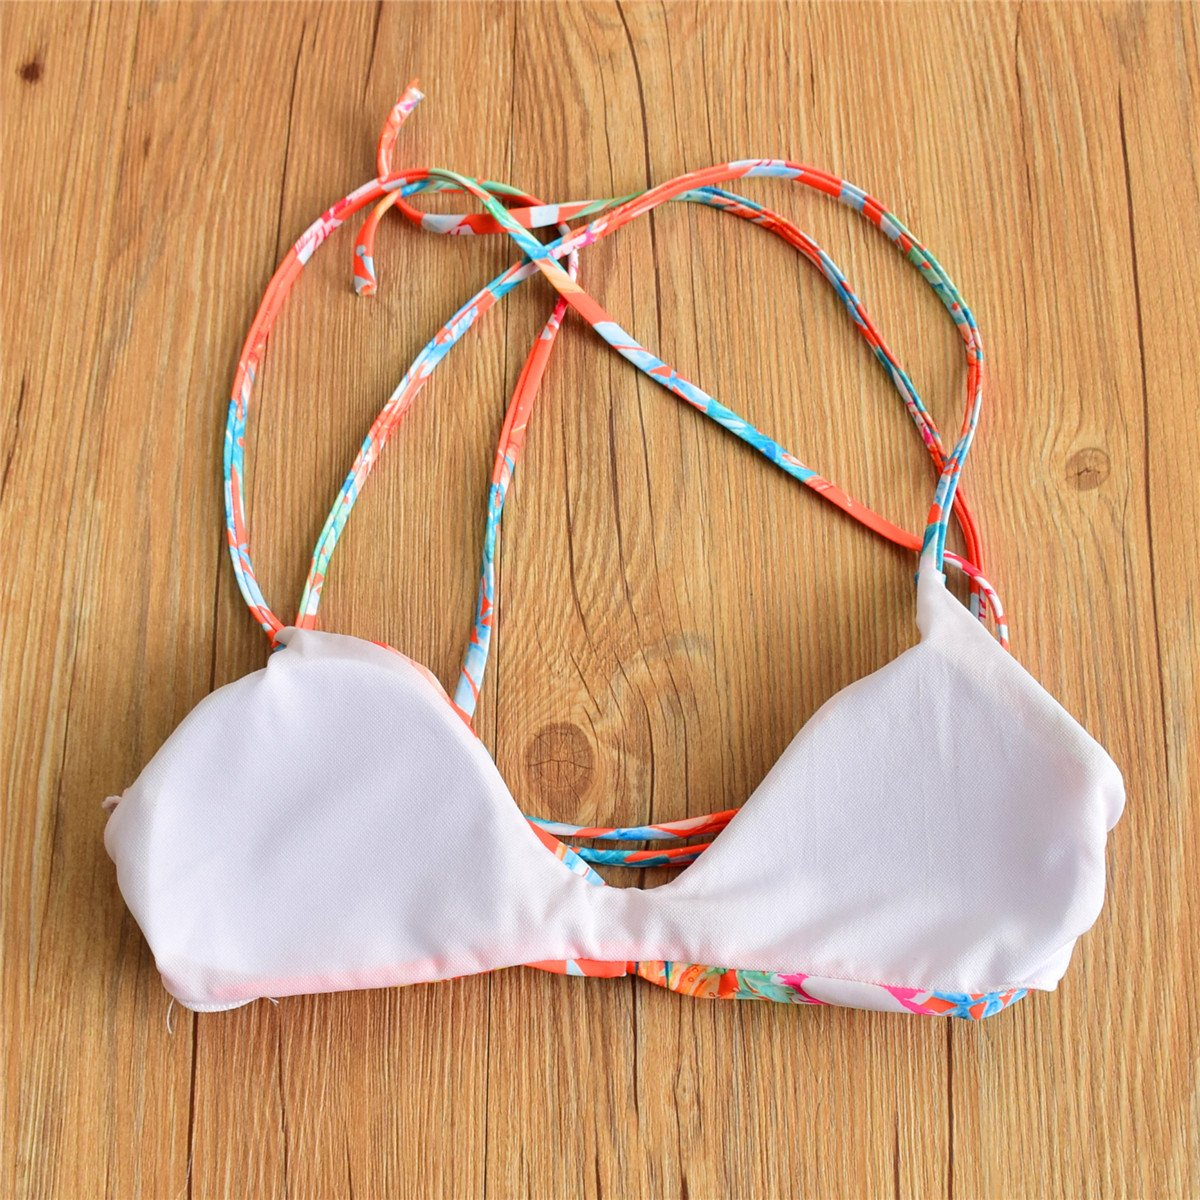 CUPLUM Floral Printing Swimwear Triangle Bikini For Women (S(US 2-4), RED/CB1704)